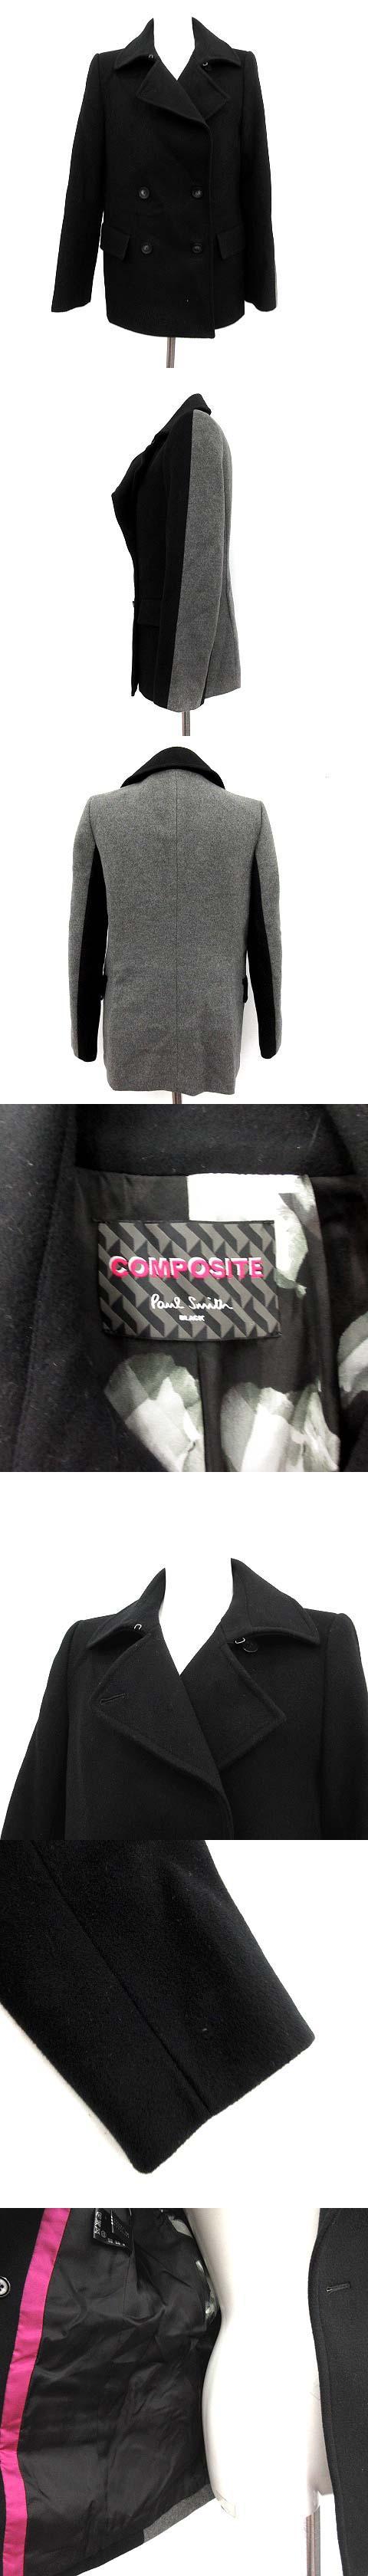 COMPOSITE Pコート ピーコート ショート ウール カシミヤ混 38 黒 ブラック グレー /KH